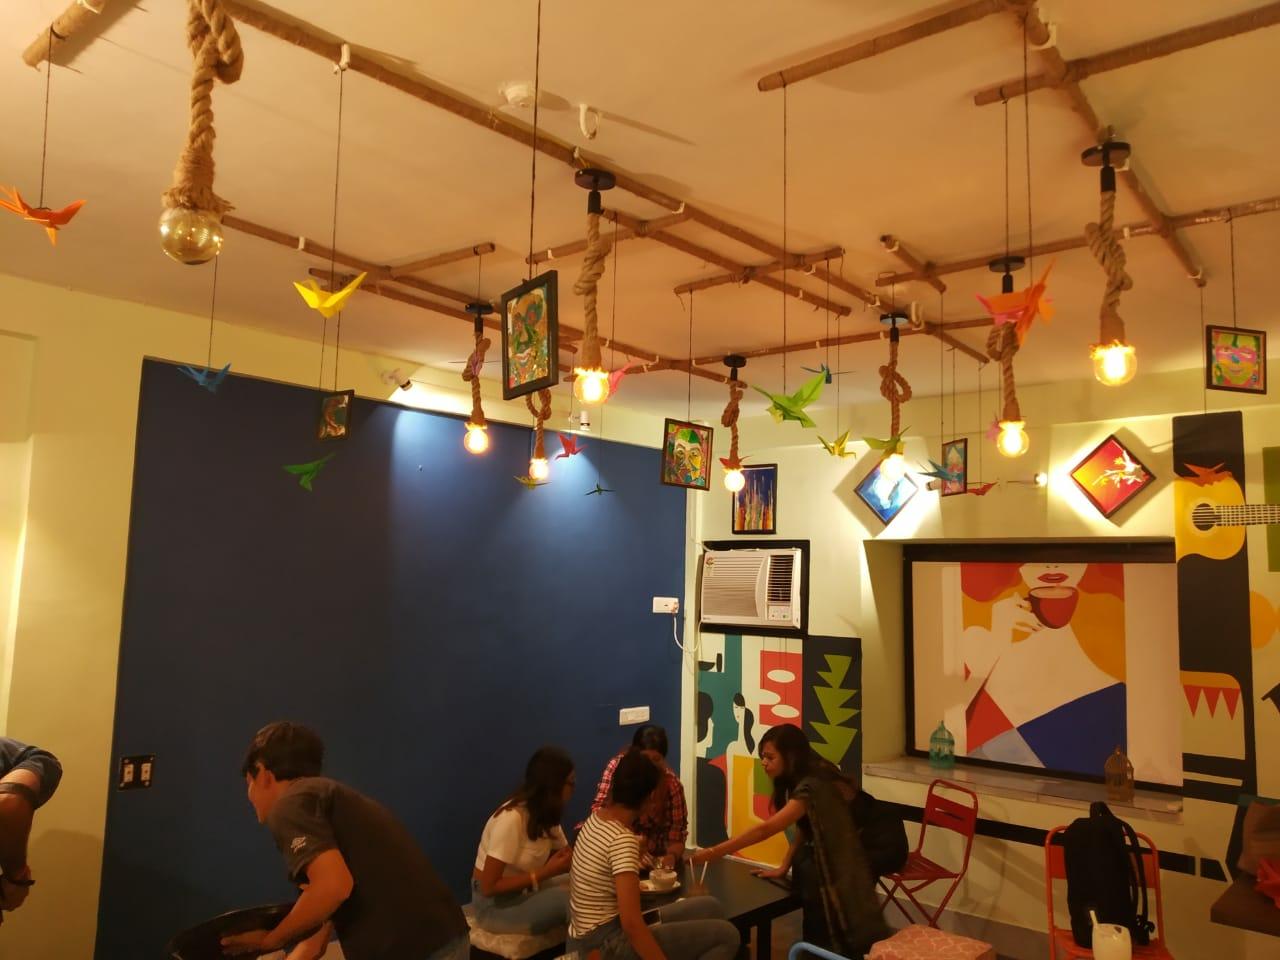 The Bhuribhoj Co.-Café Art Street